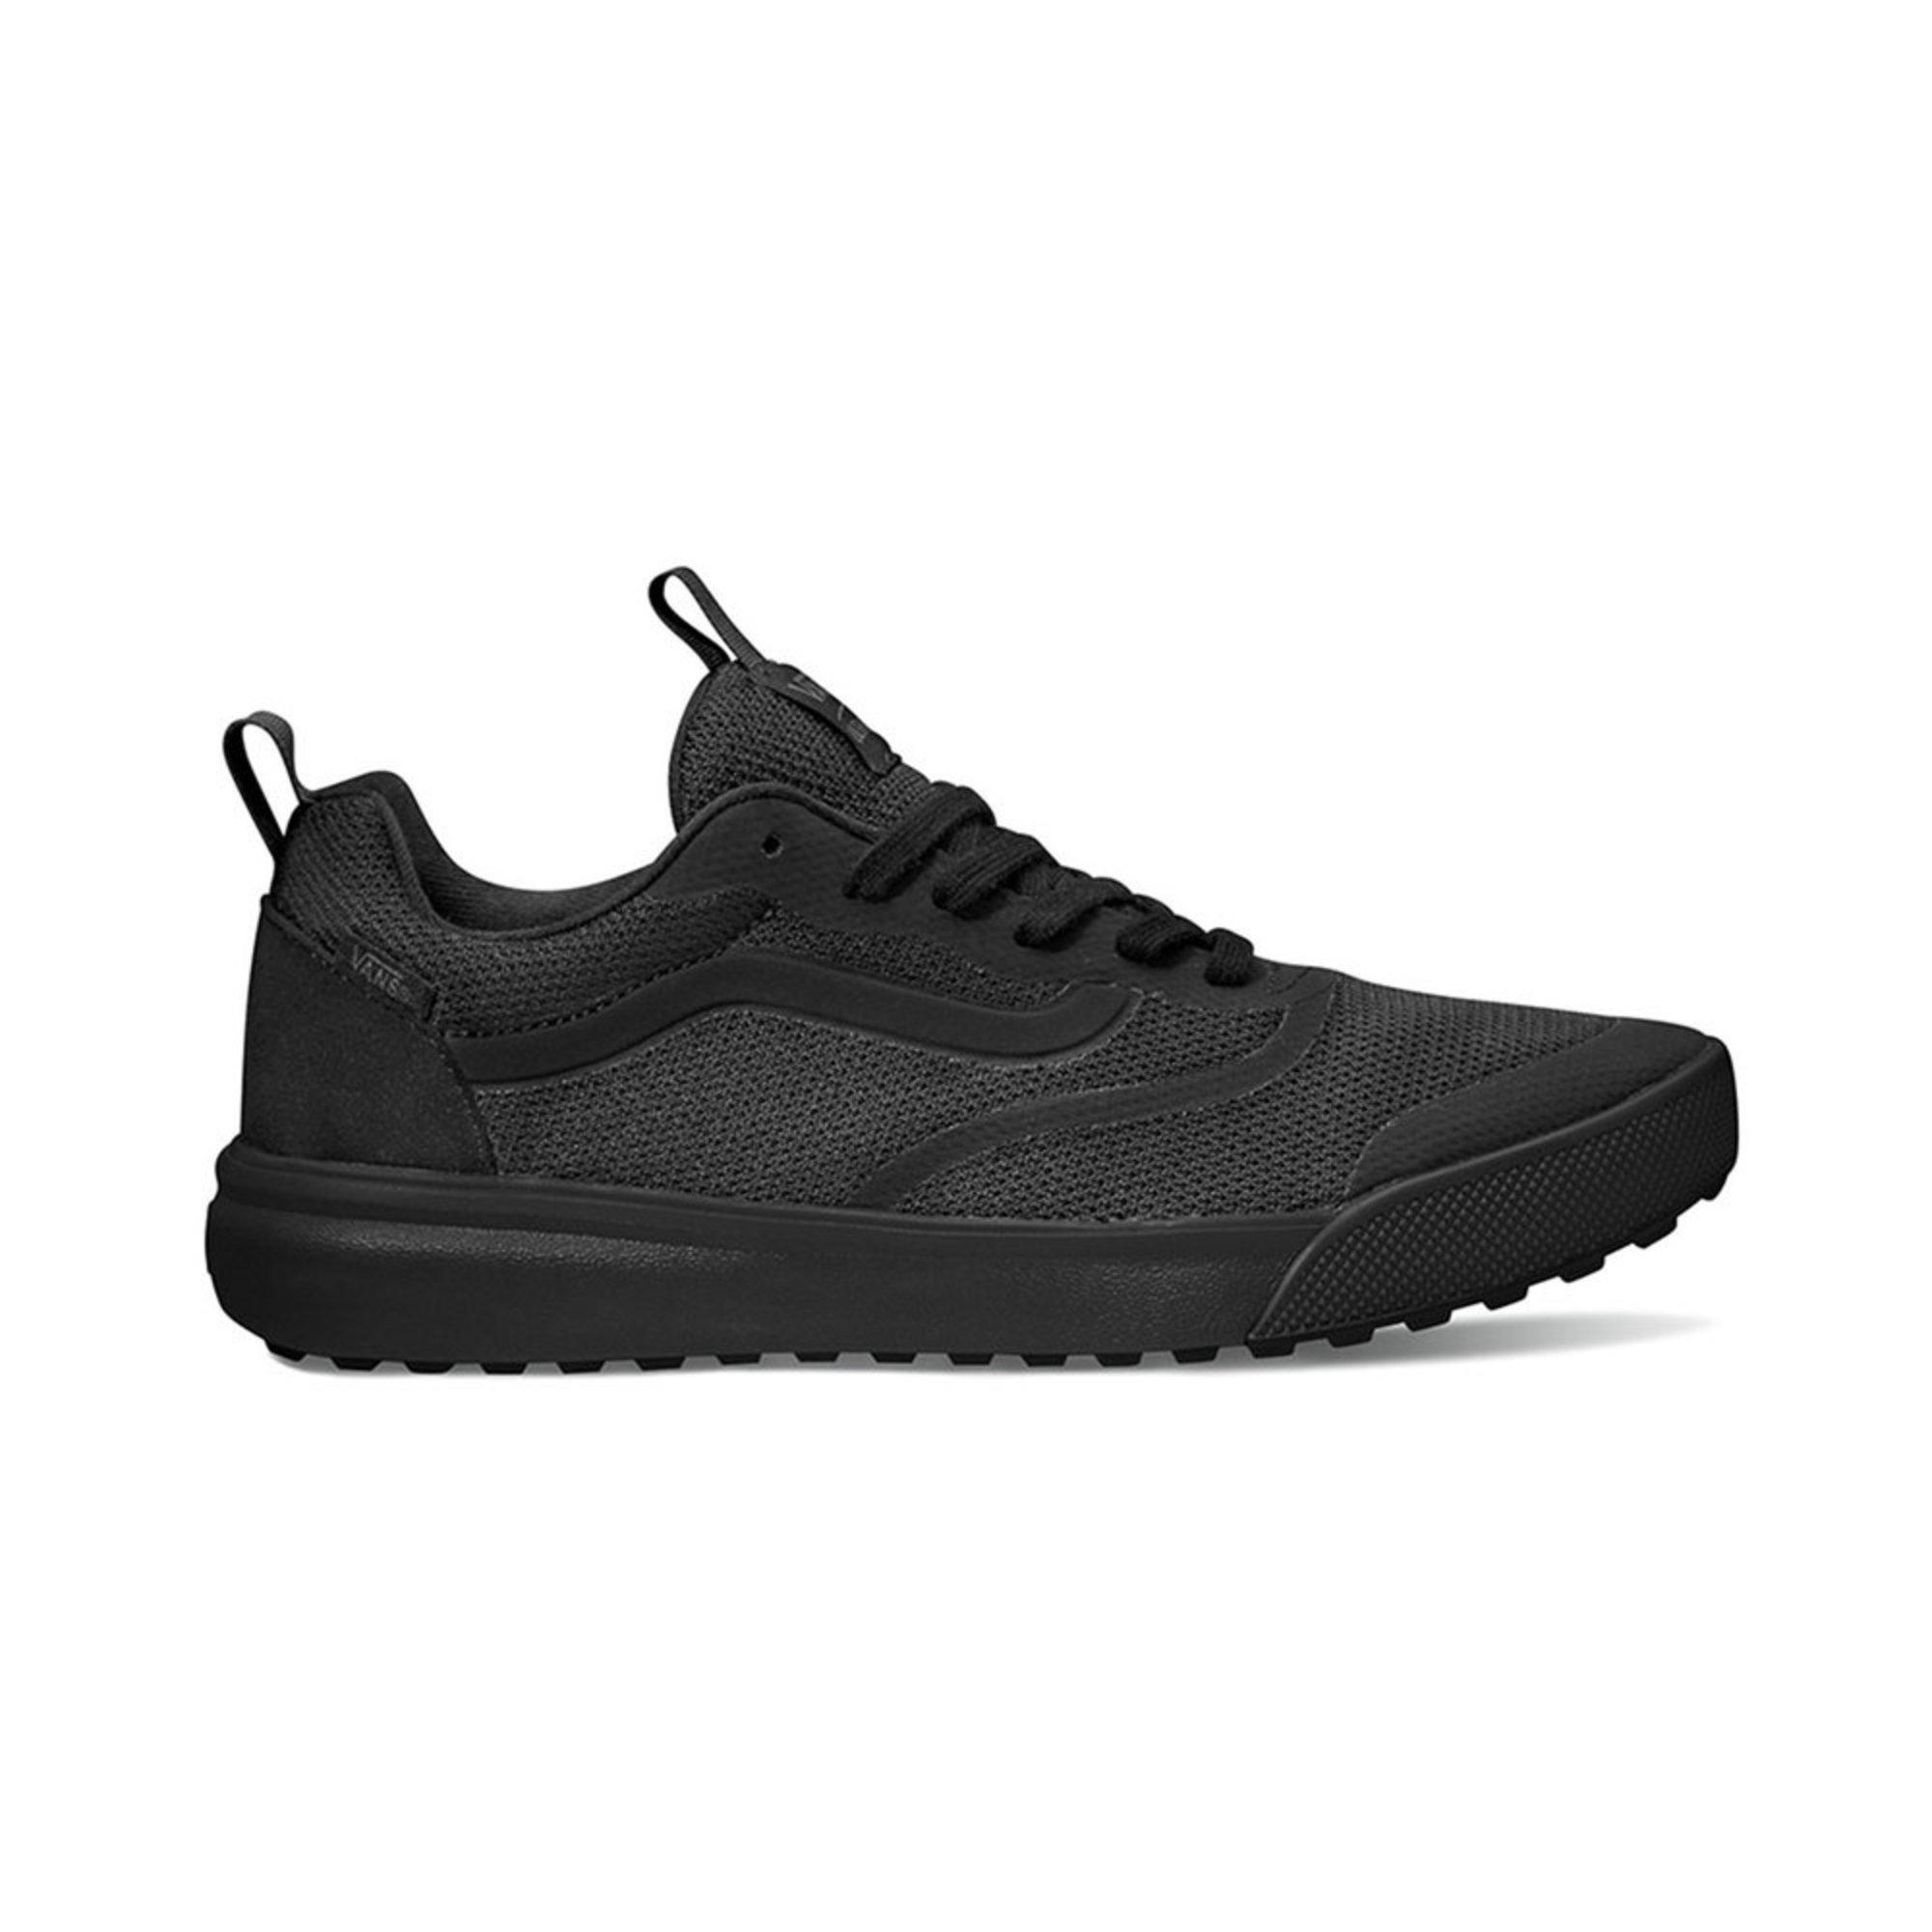 397da3c124d Vans Men s Ultrarange Rapidweld Shoe